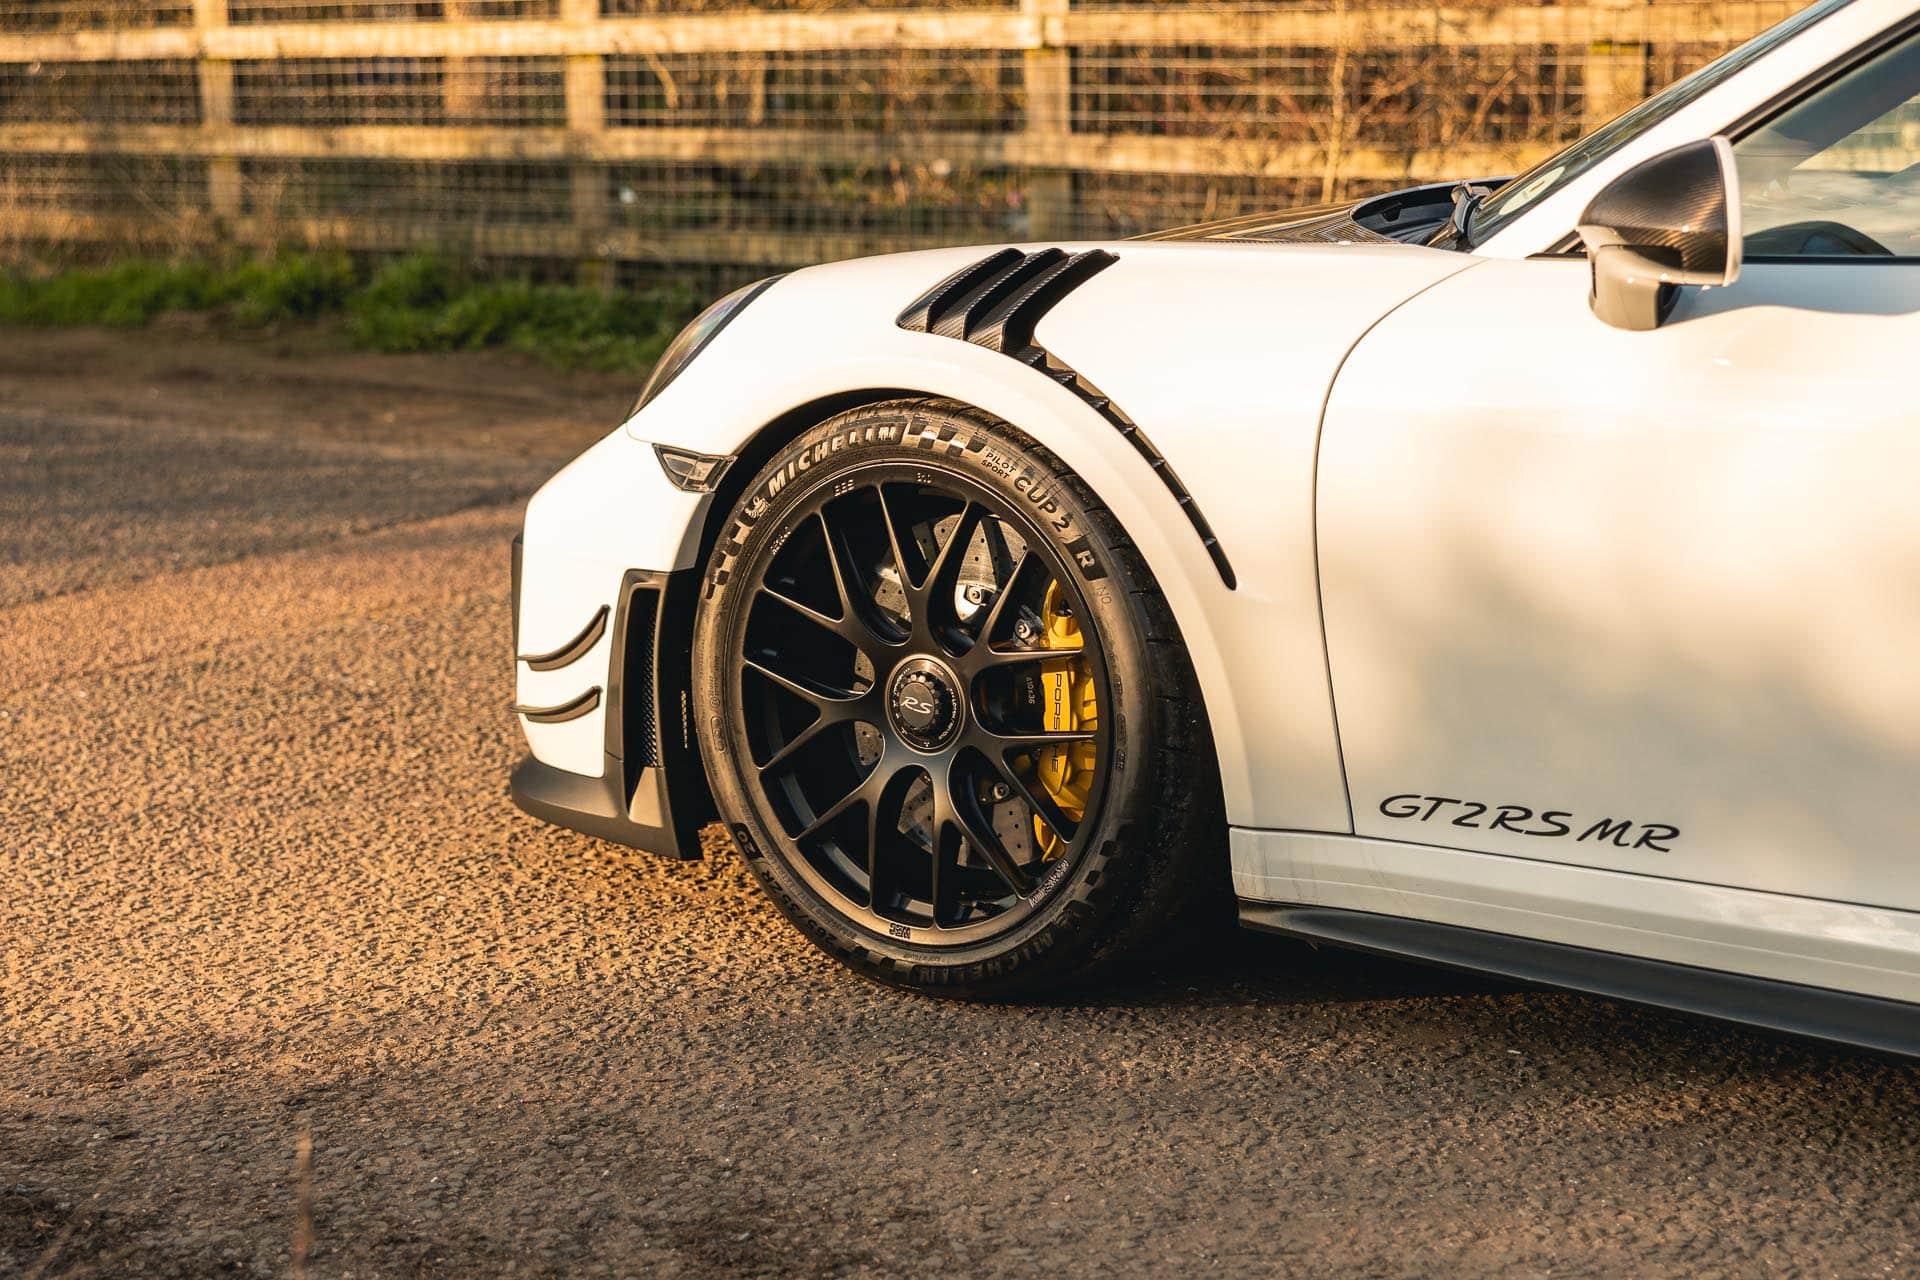 gt2rs-mr-wheel